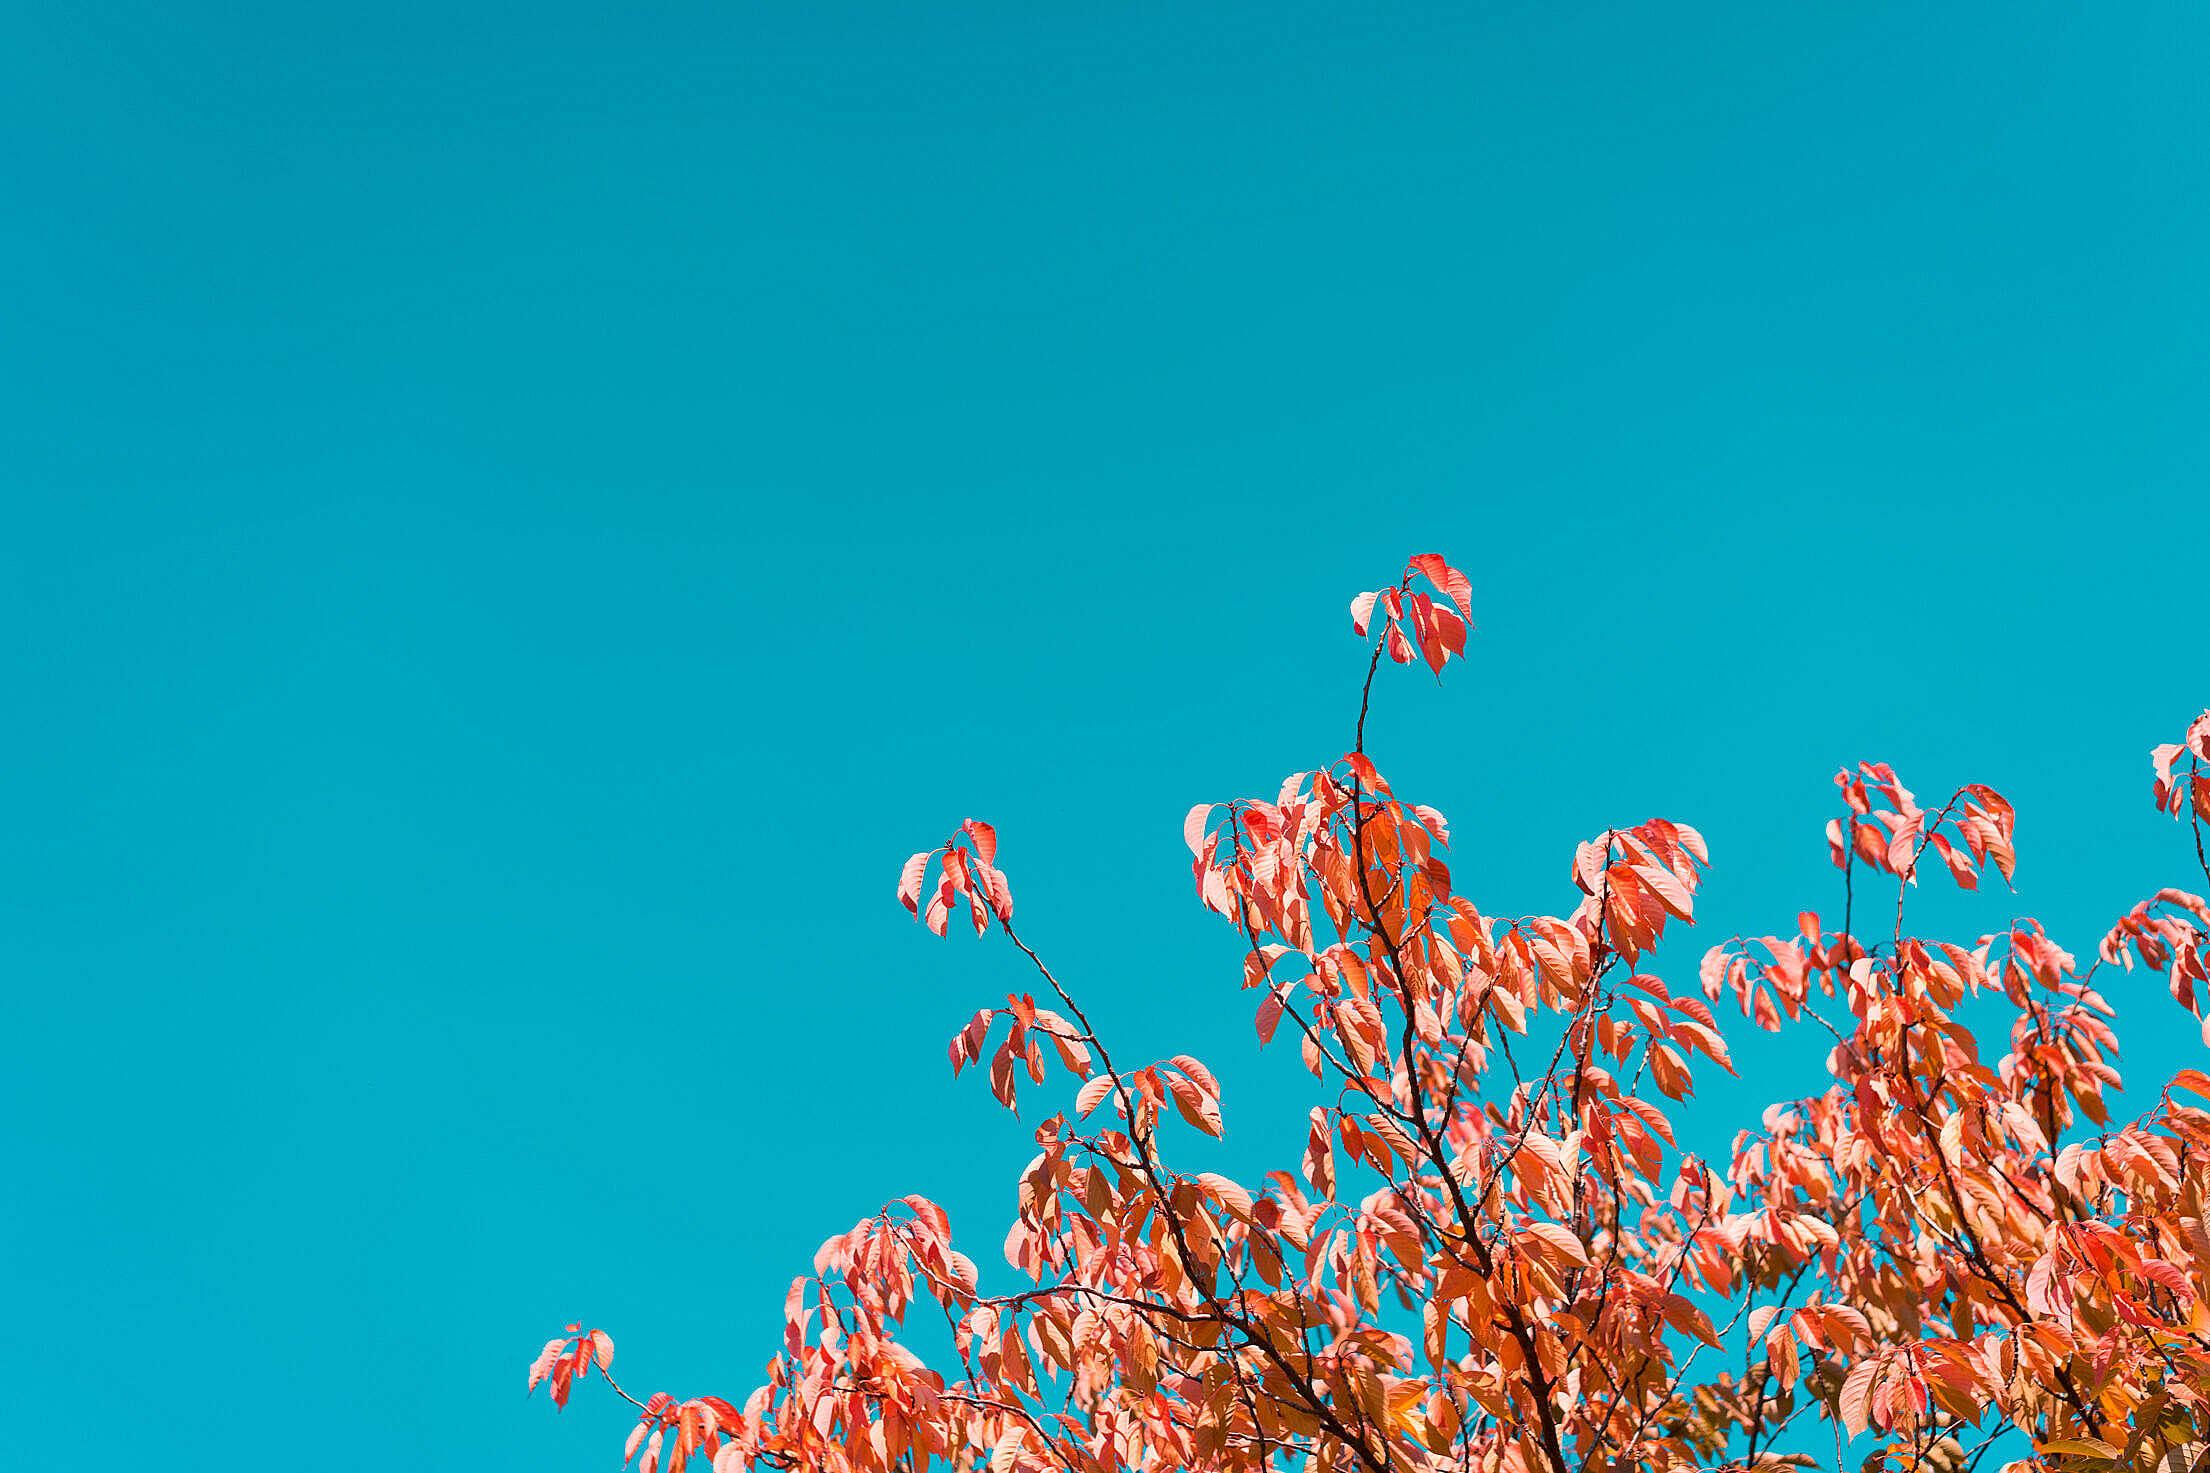 Fall Tree Against Bright Sky Free Stock Photo